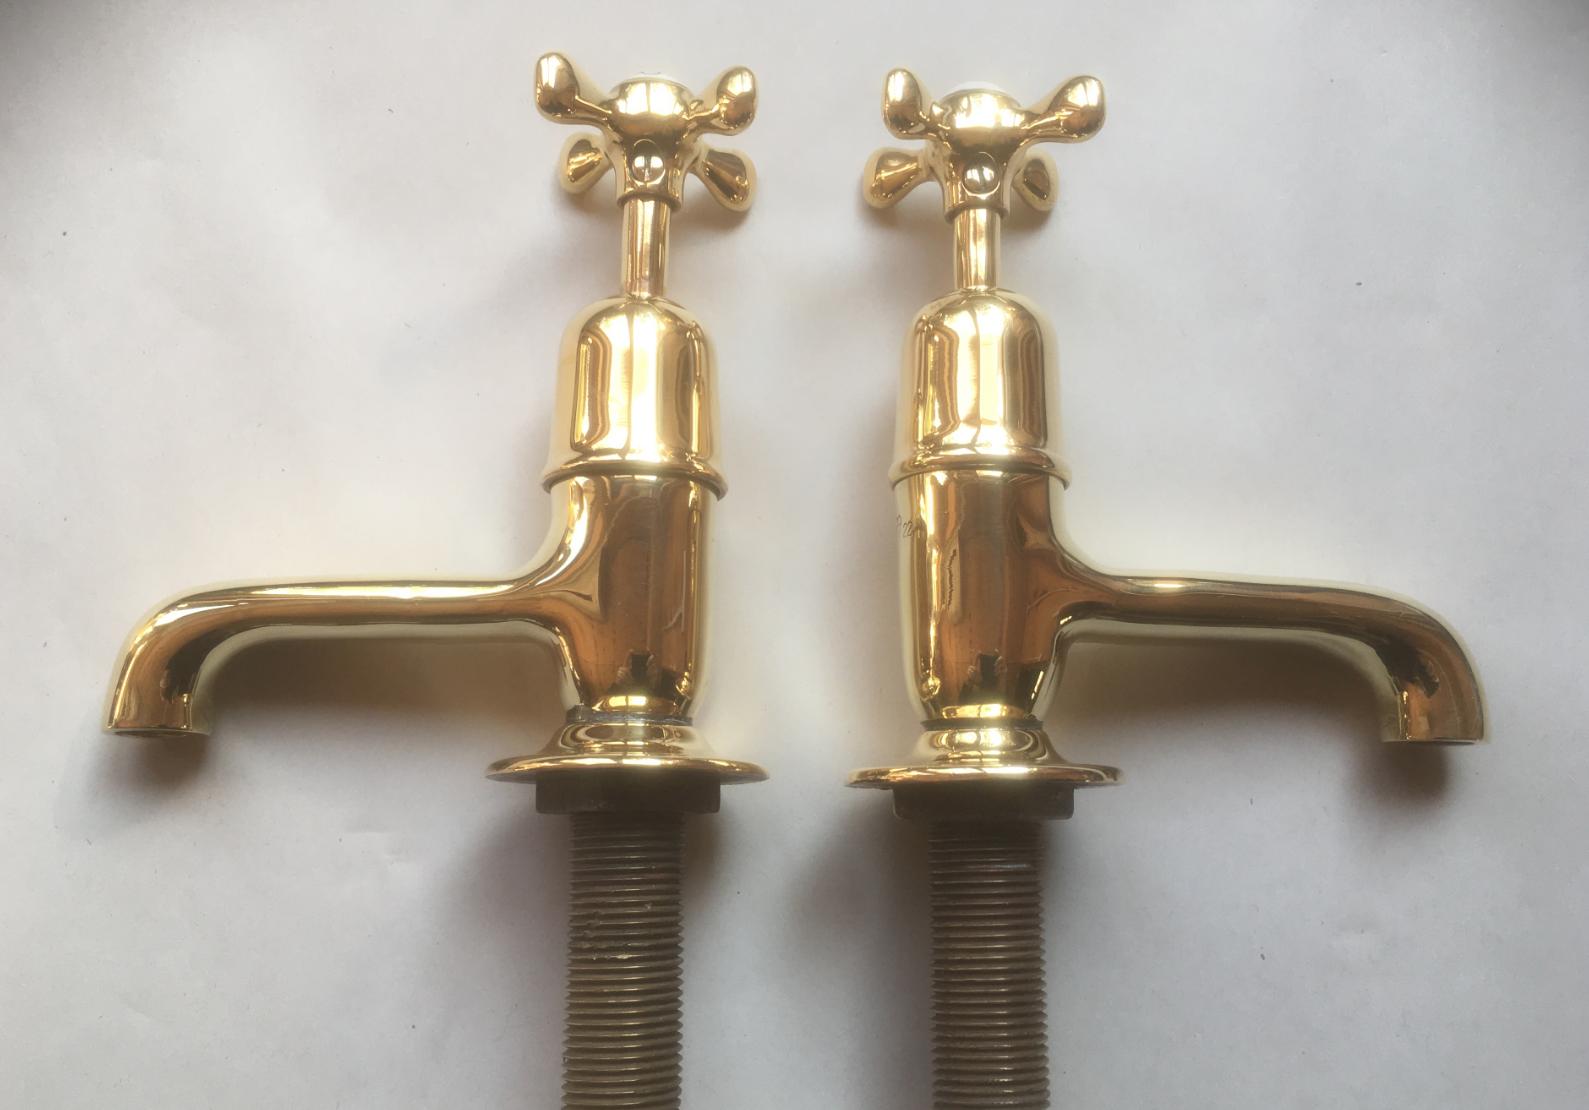 Polished brass basin taps 3.5″